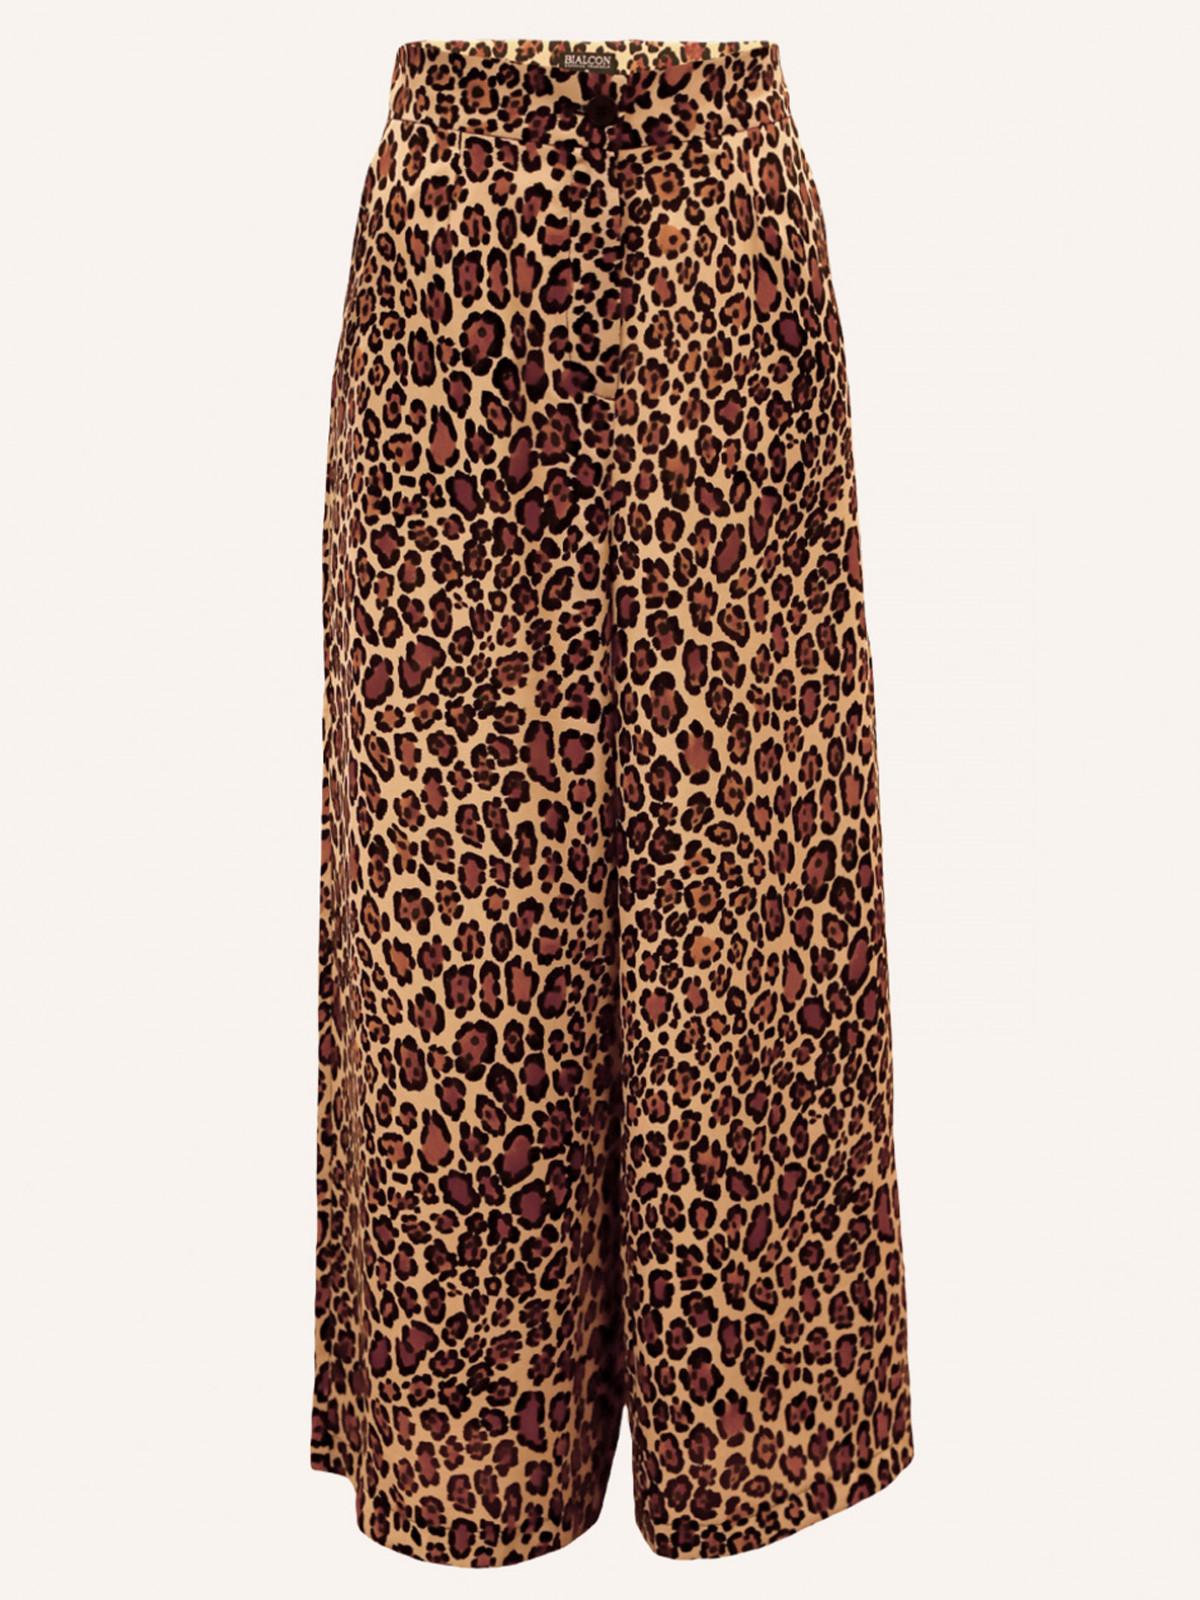 Spodnie wpanterkę